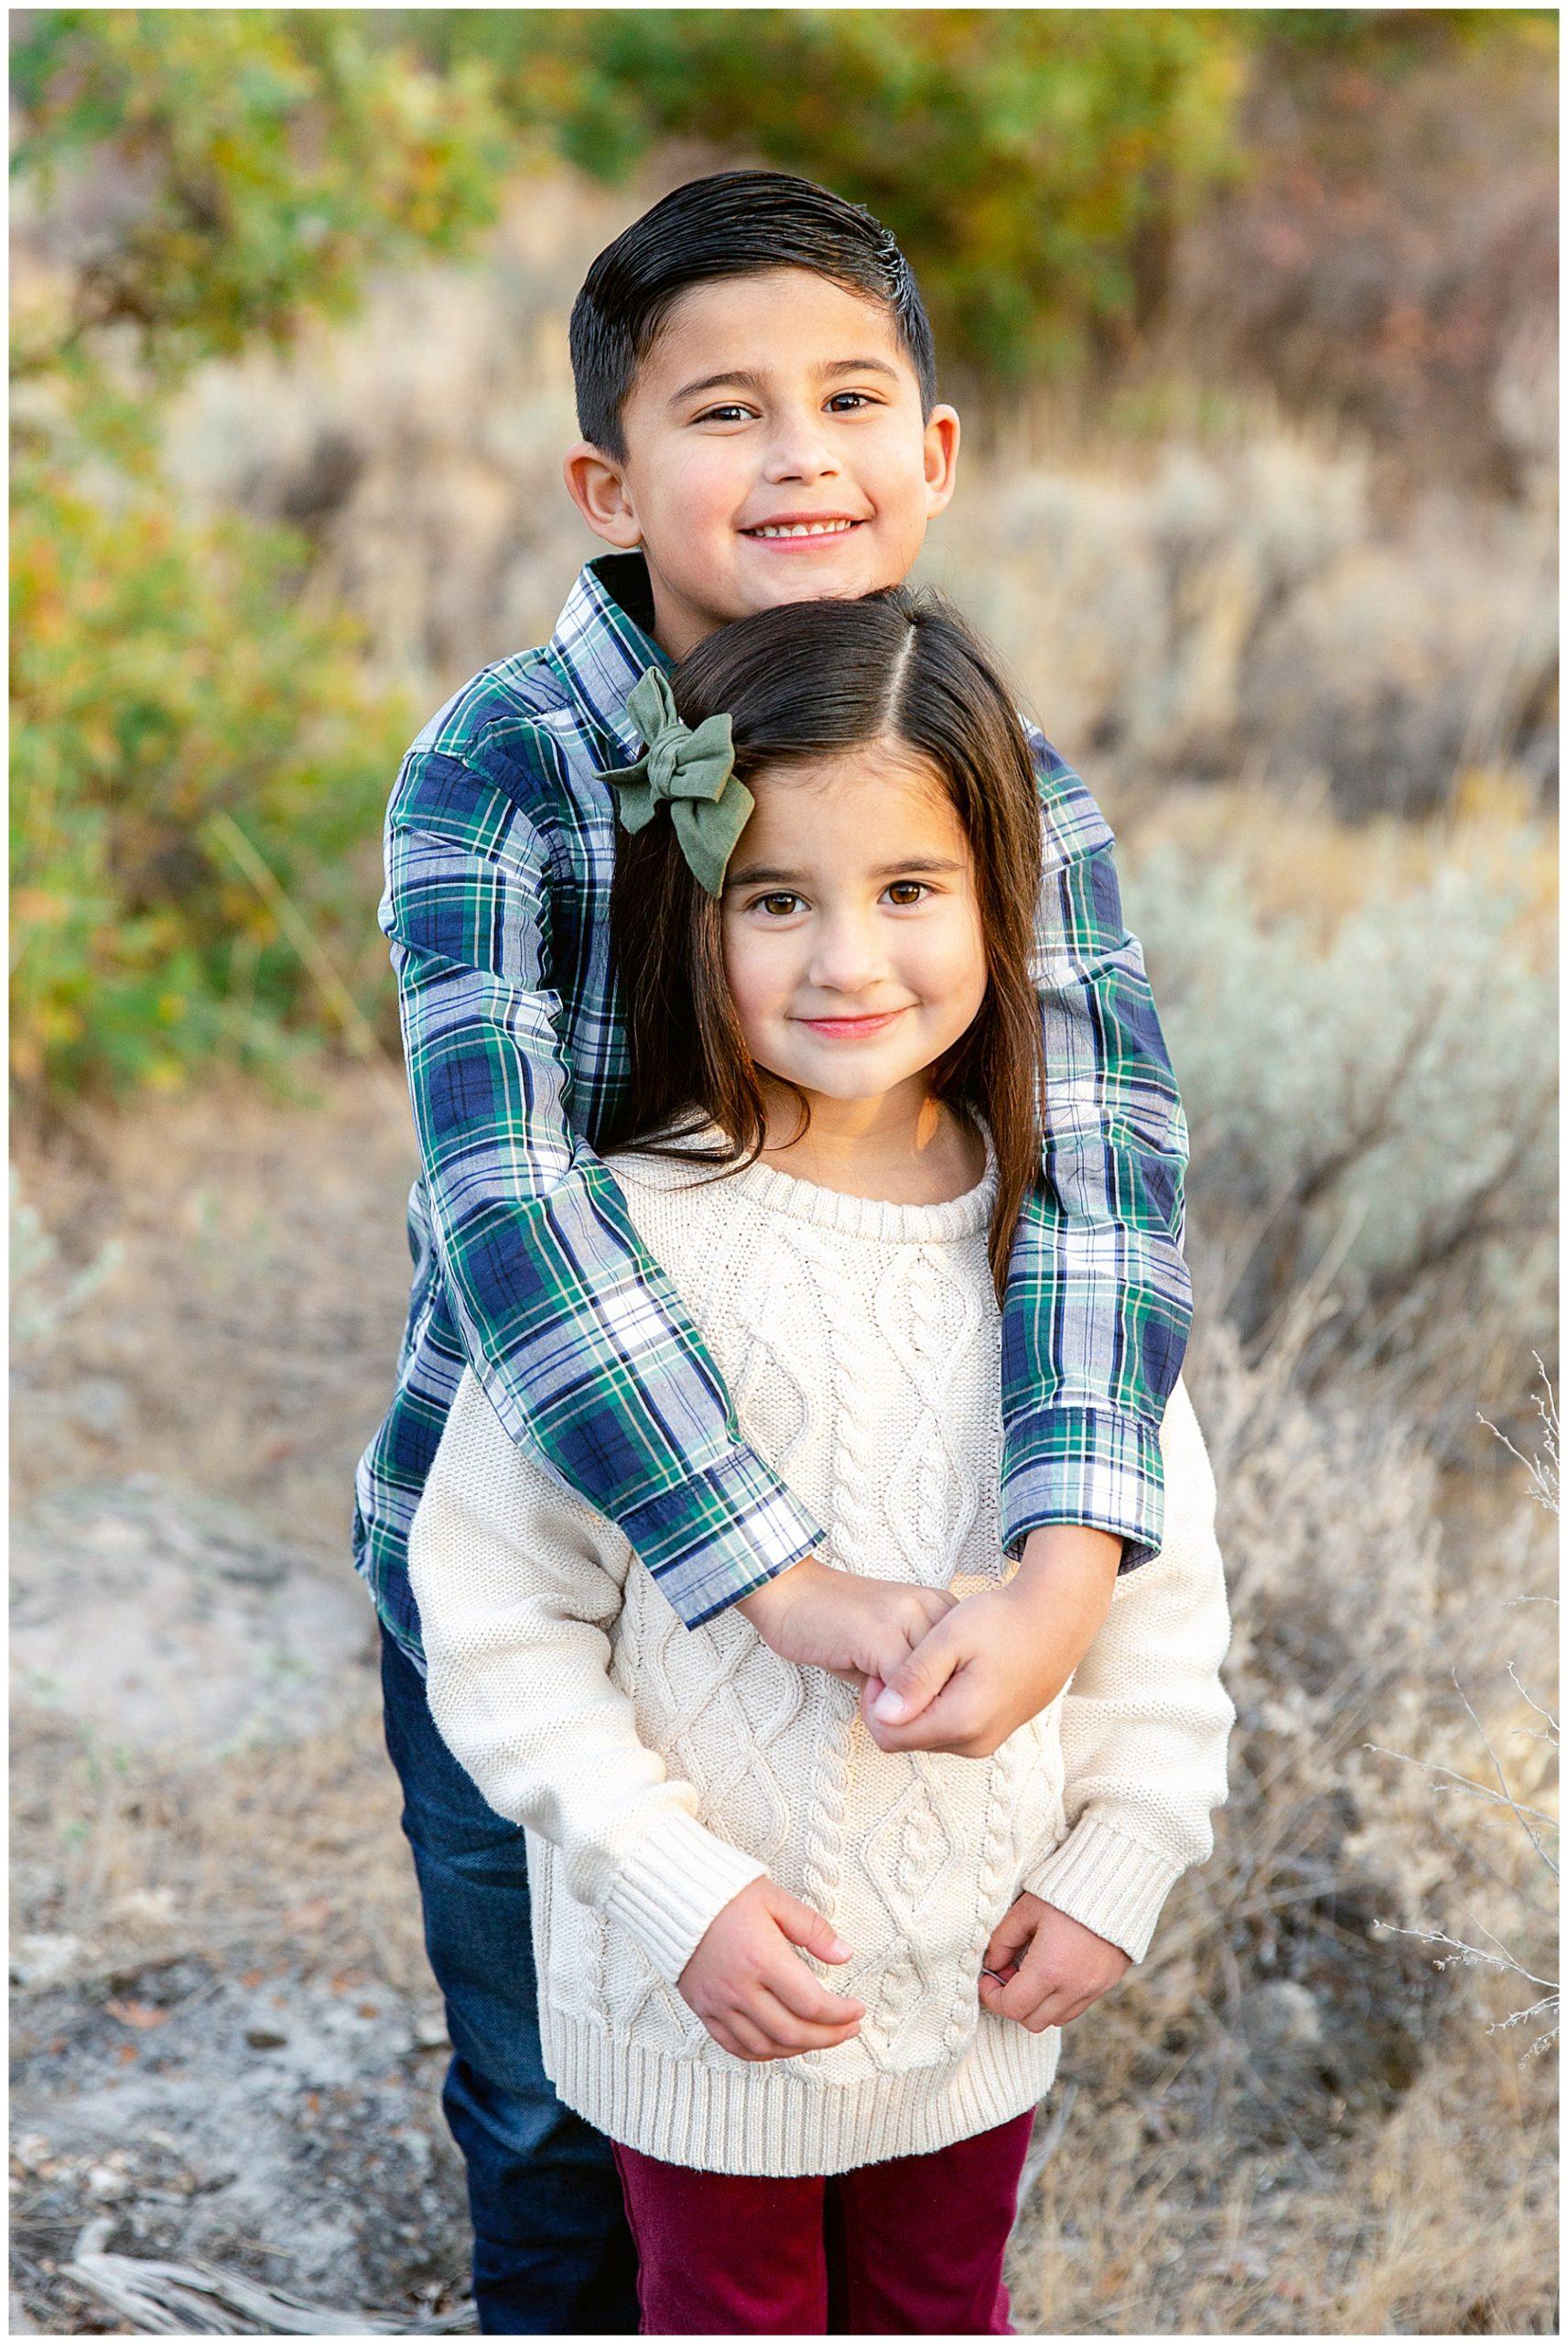 Utah Family Photographer, Utah Family Portraits, Utah Valley Family Photographer